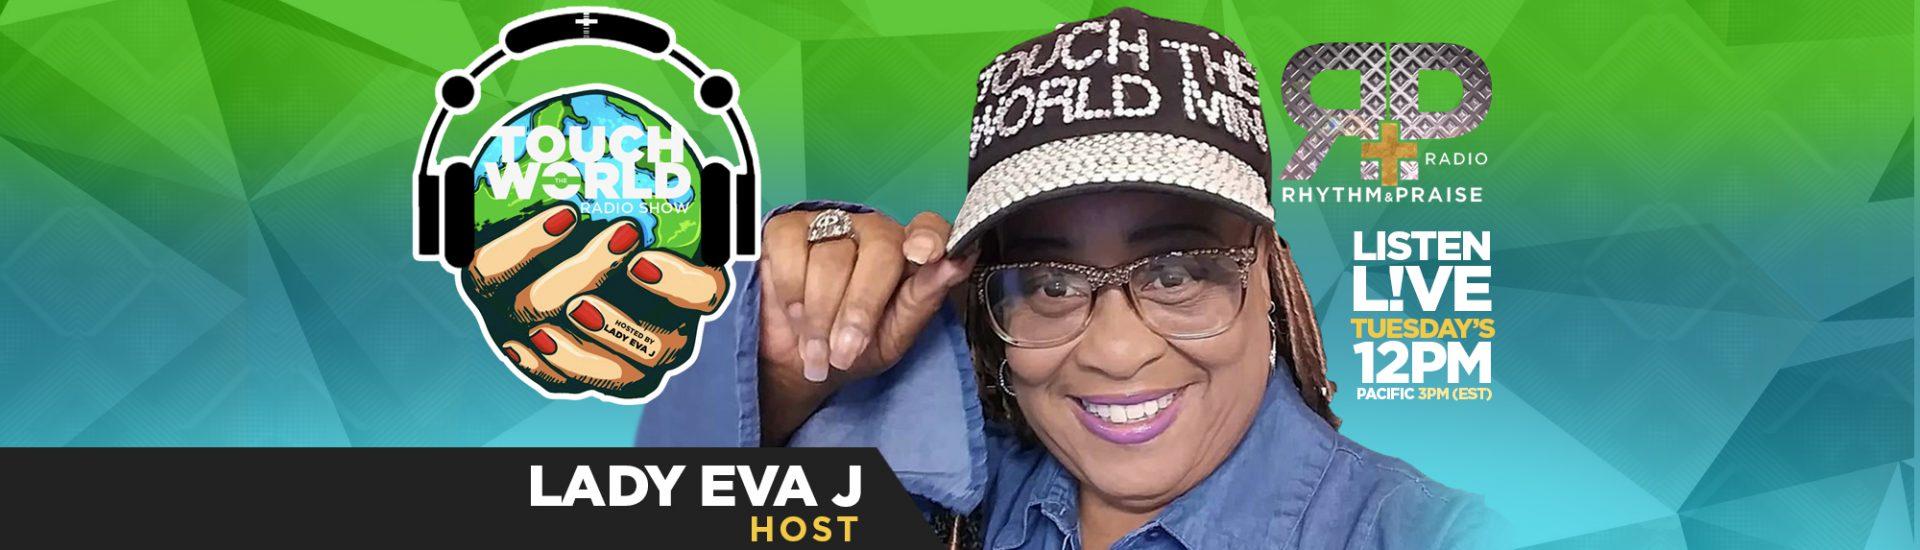 Lady Eva J - Touch the World